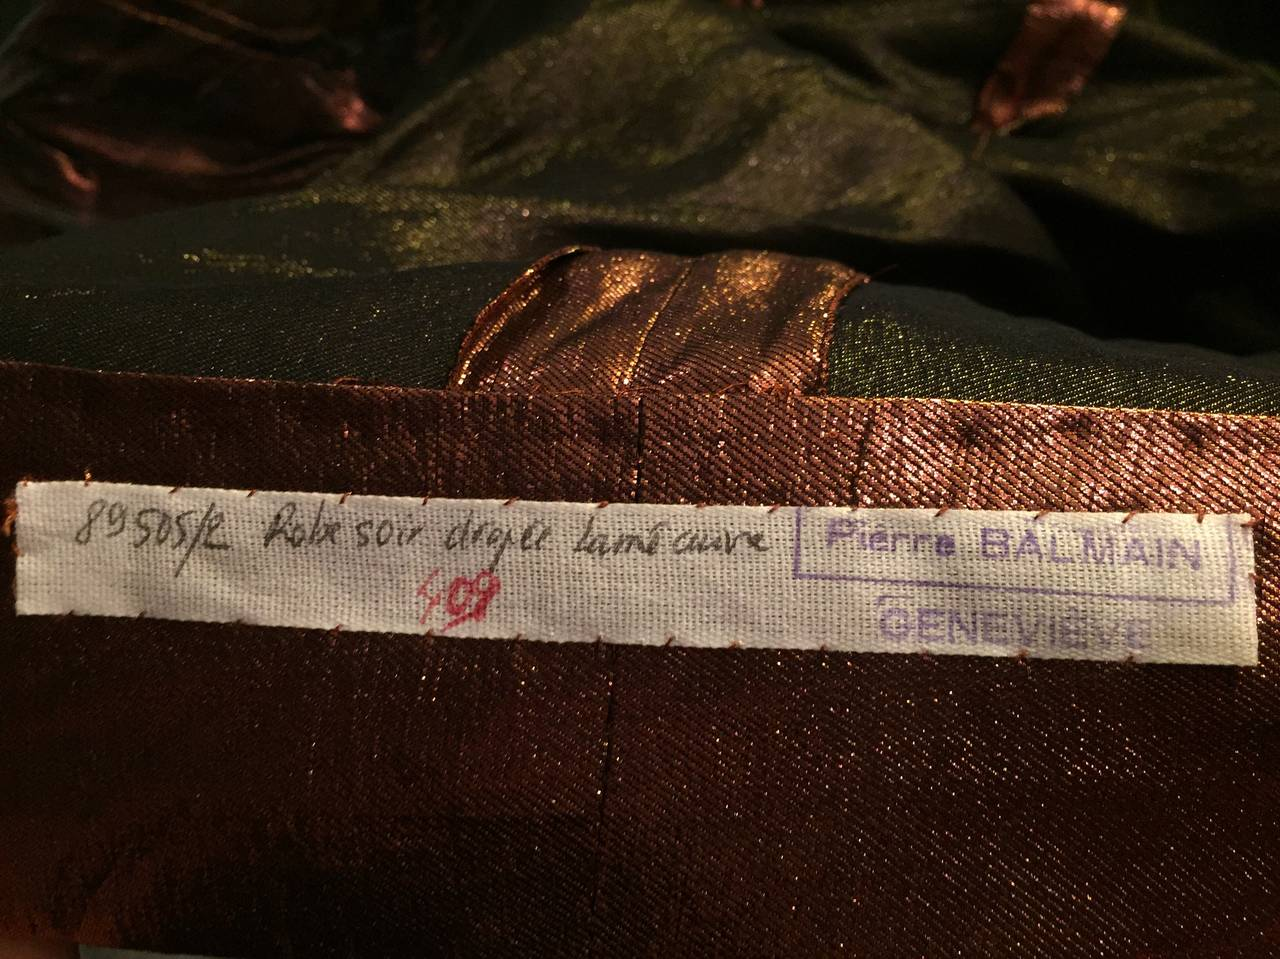 Pierre Balmain Runway Couture Copper Metallic Silk Gown Size Small Circa 1980's For Sale 3